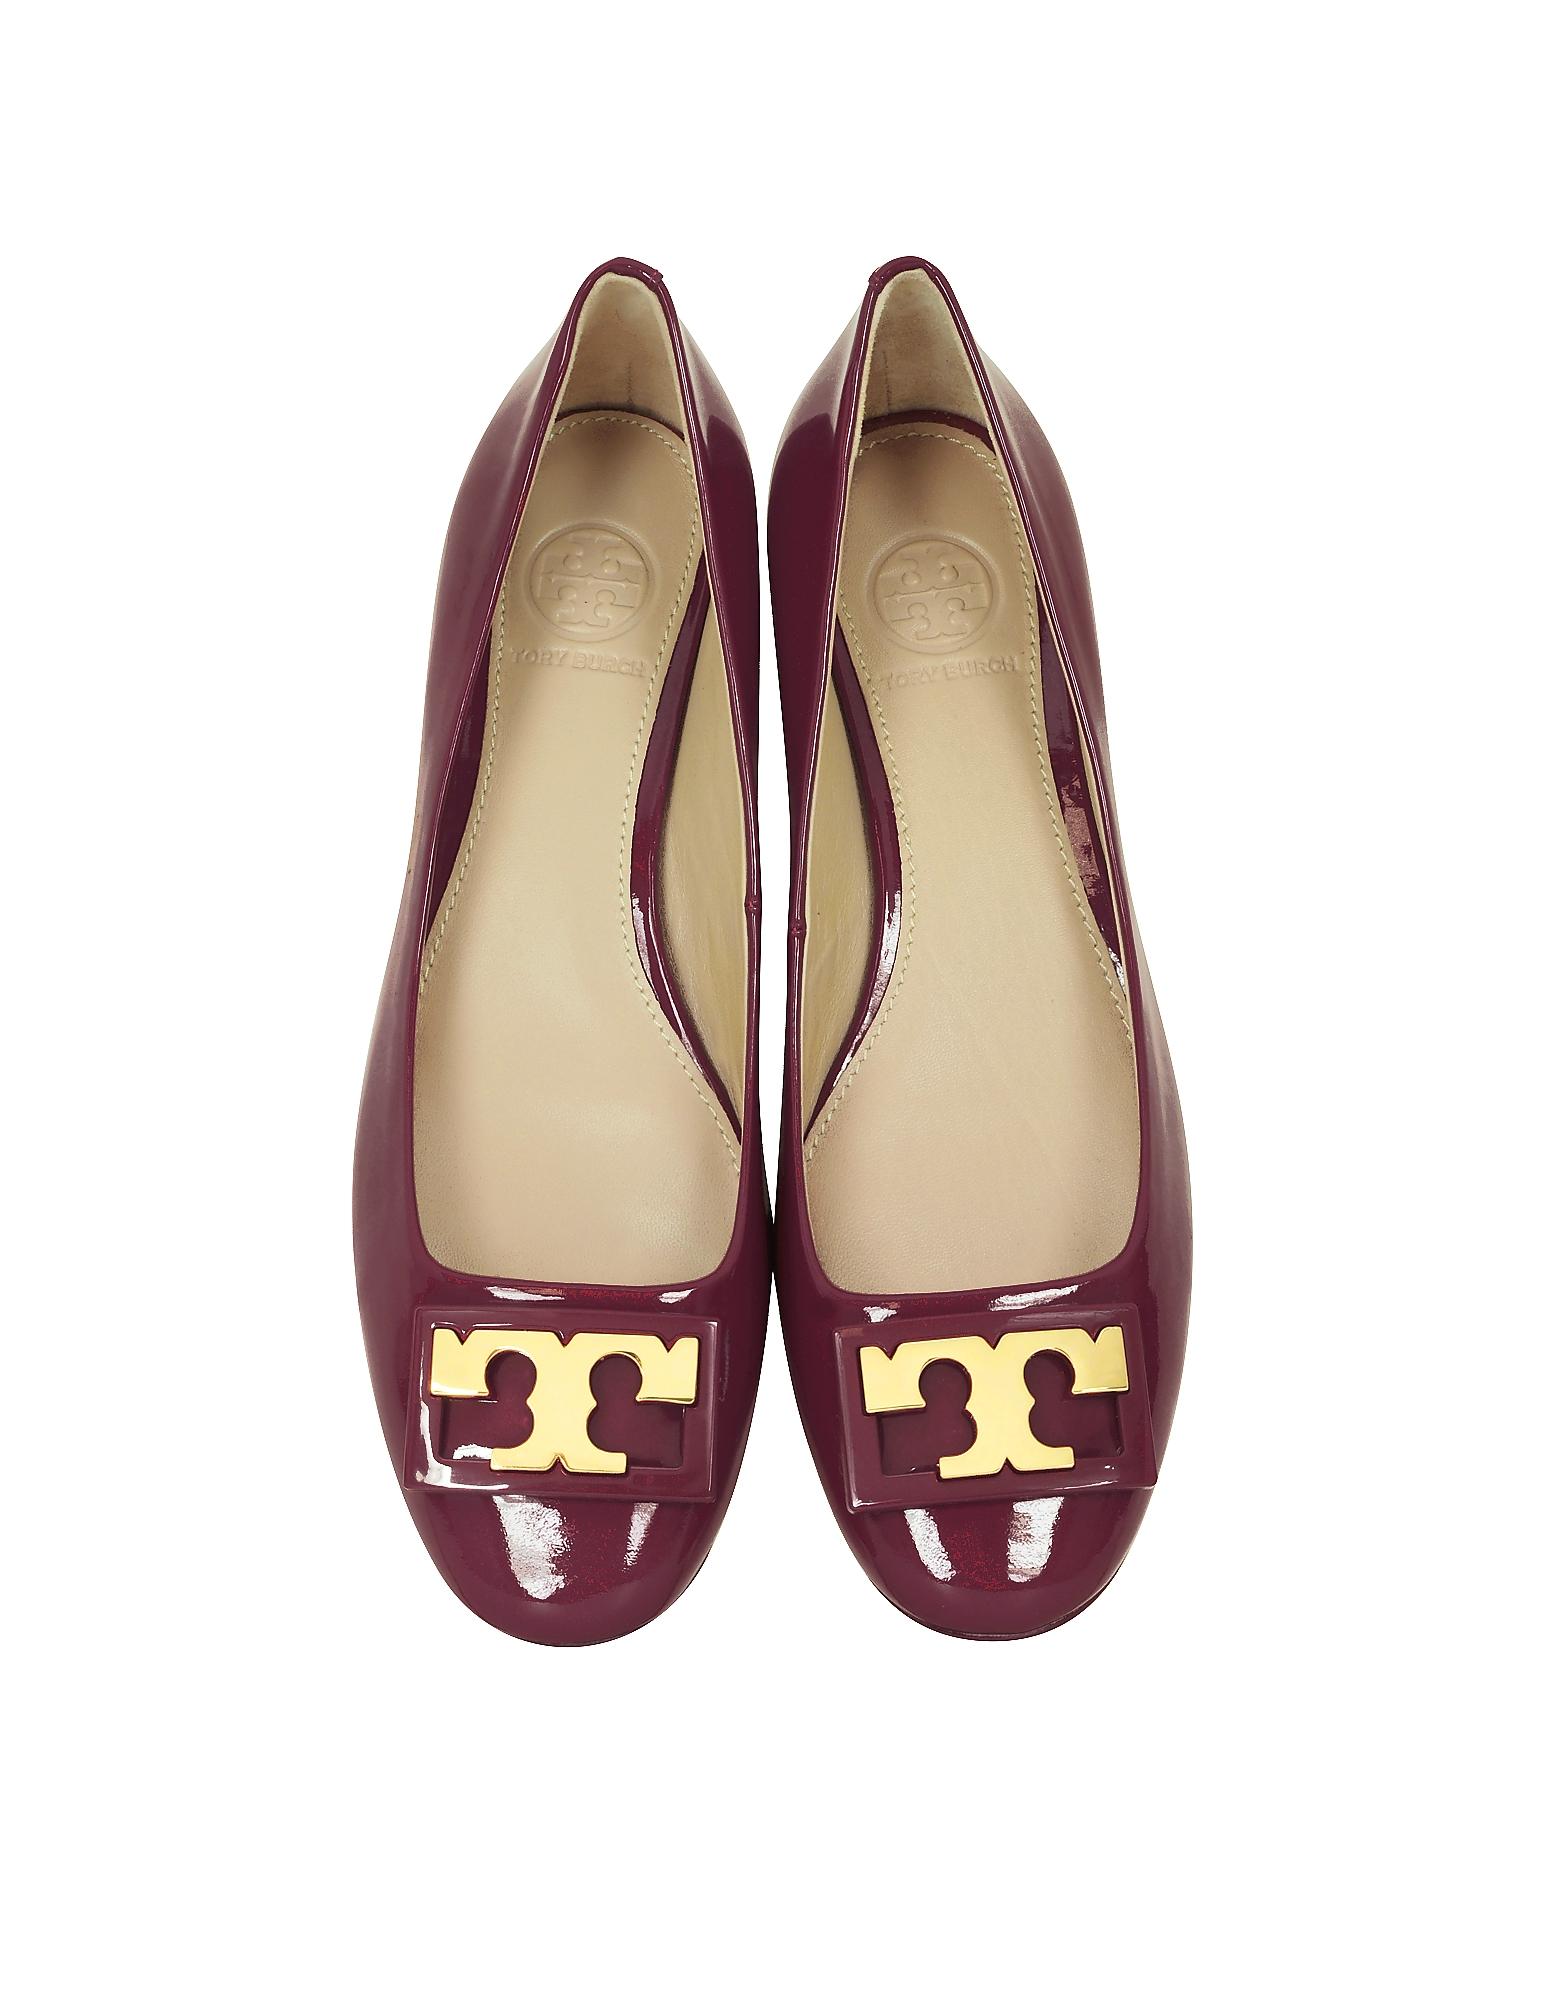 1025af2b3 Lyst - Tory Burch Gigi Burgundy Patent Leather Mid-heel Pump